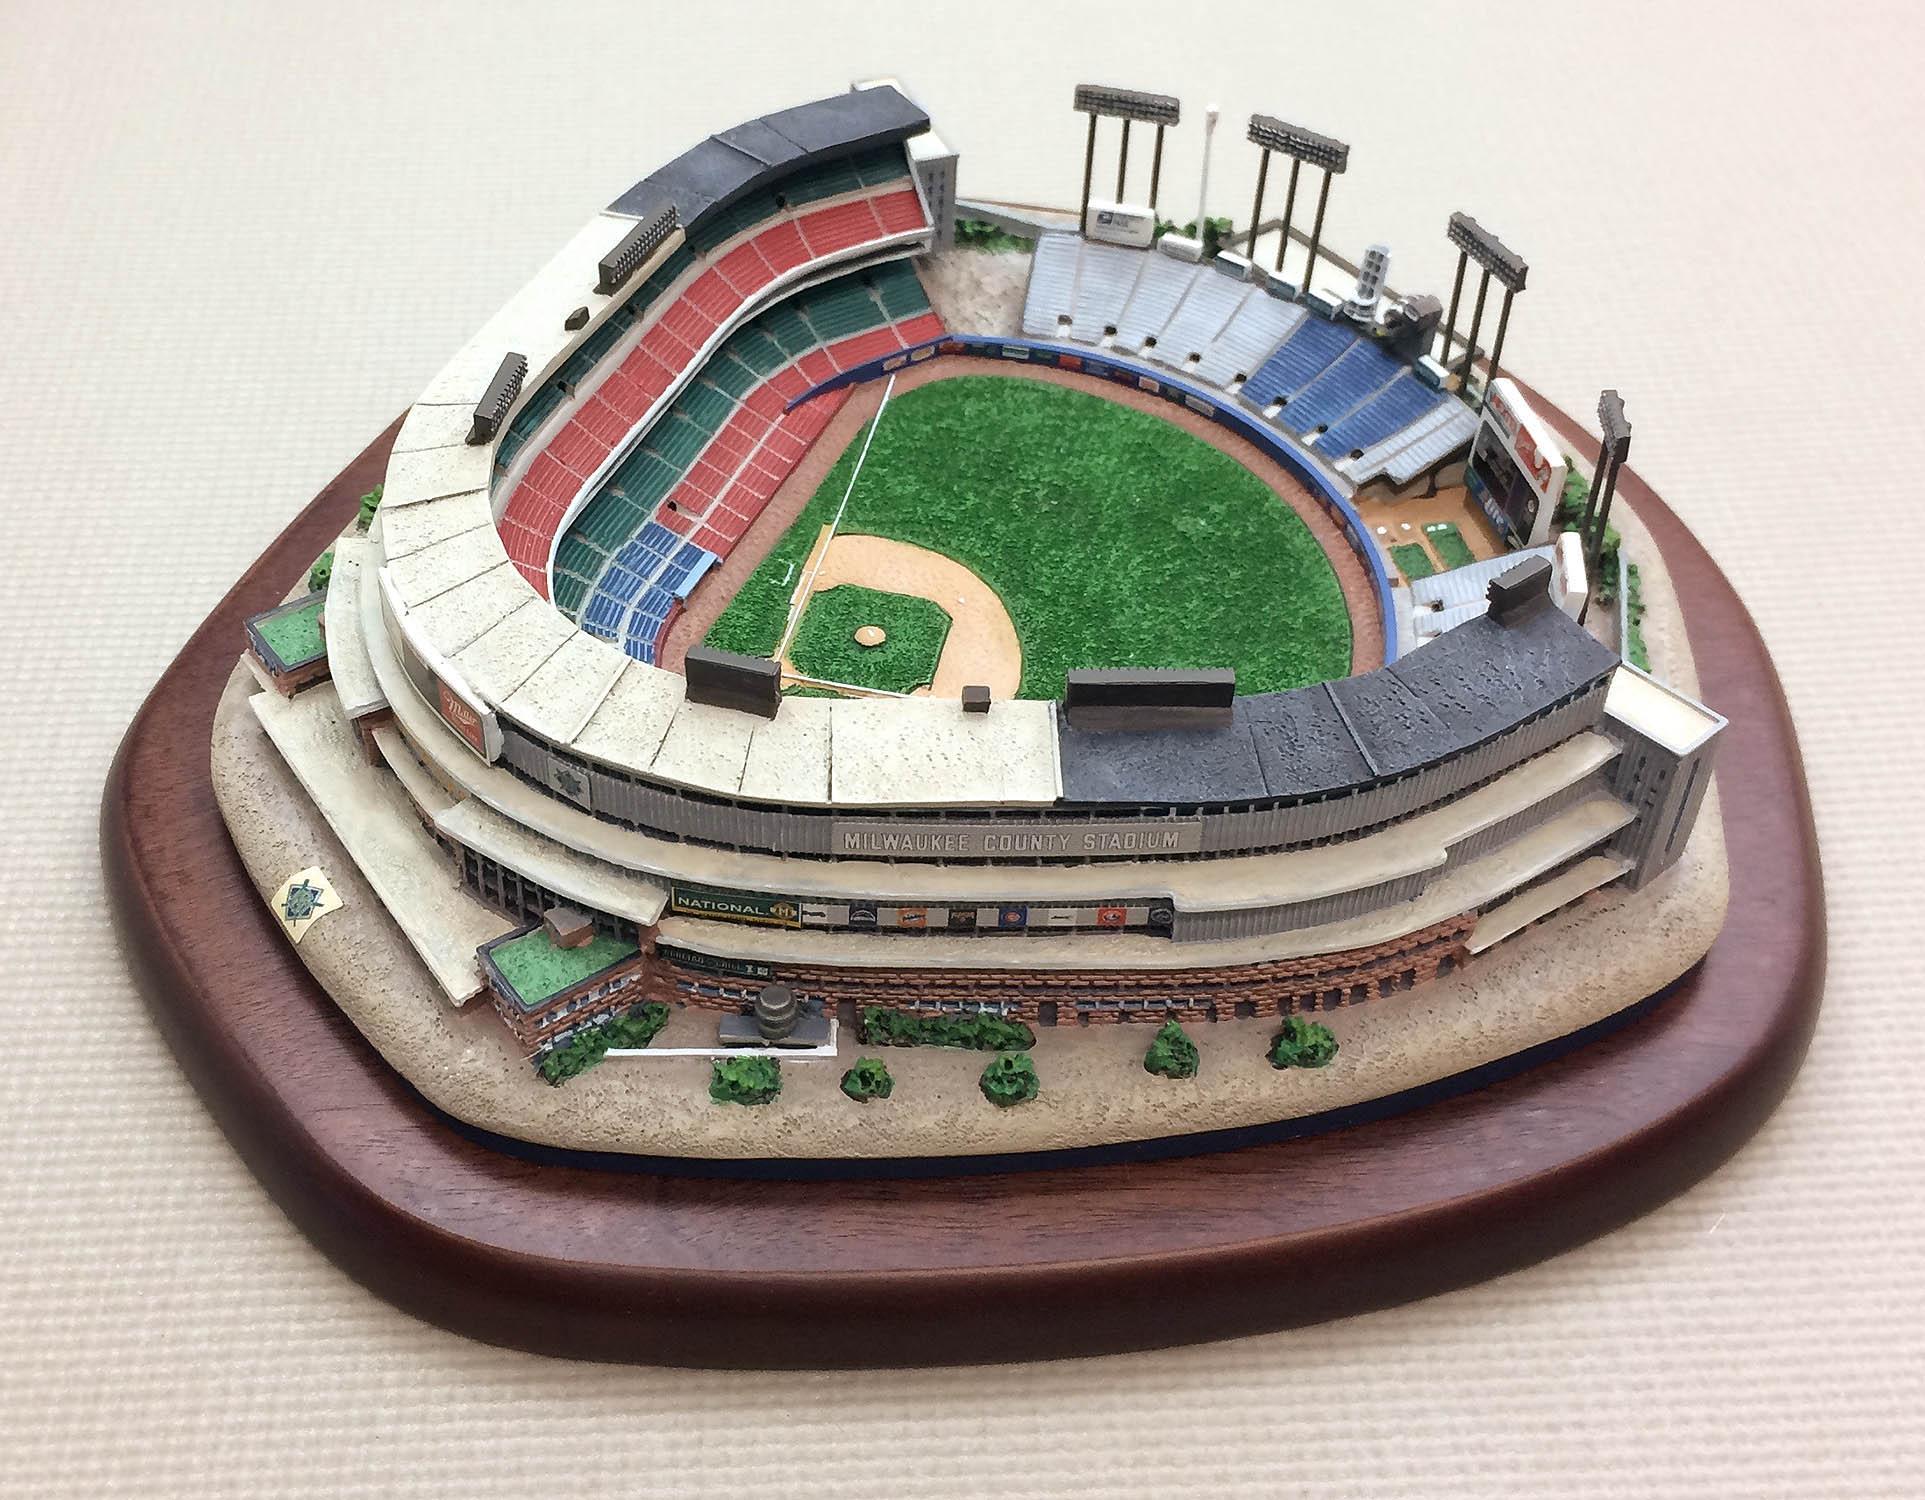 differently d61cd eb572 Milwaukee County Stadium Replica